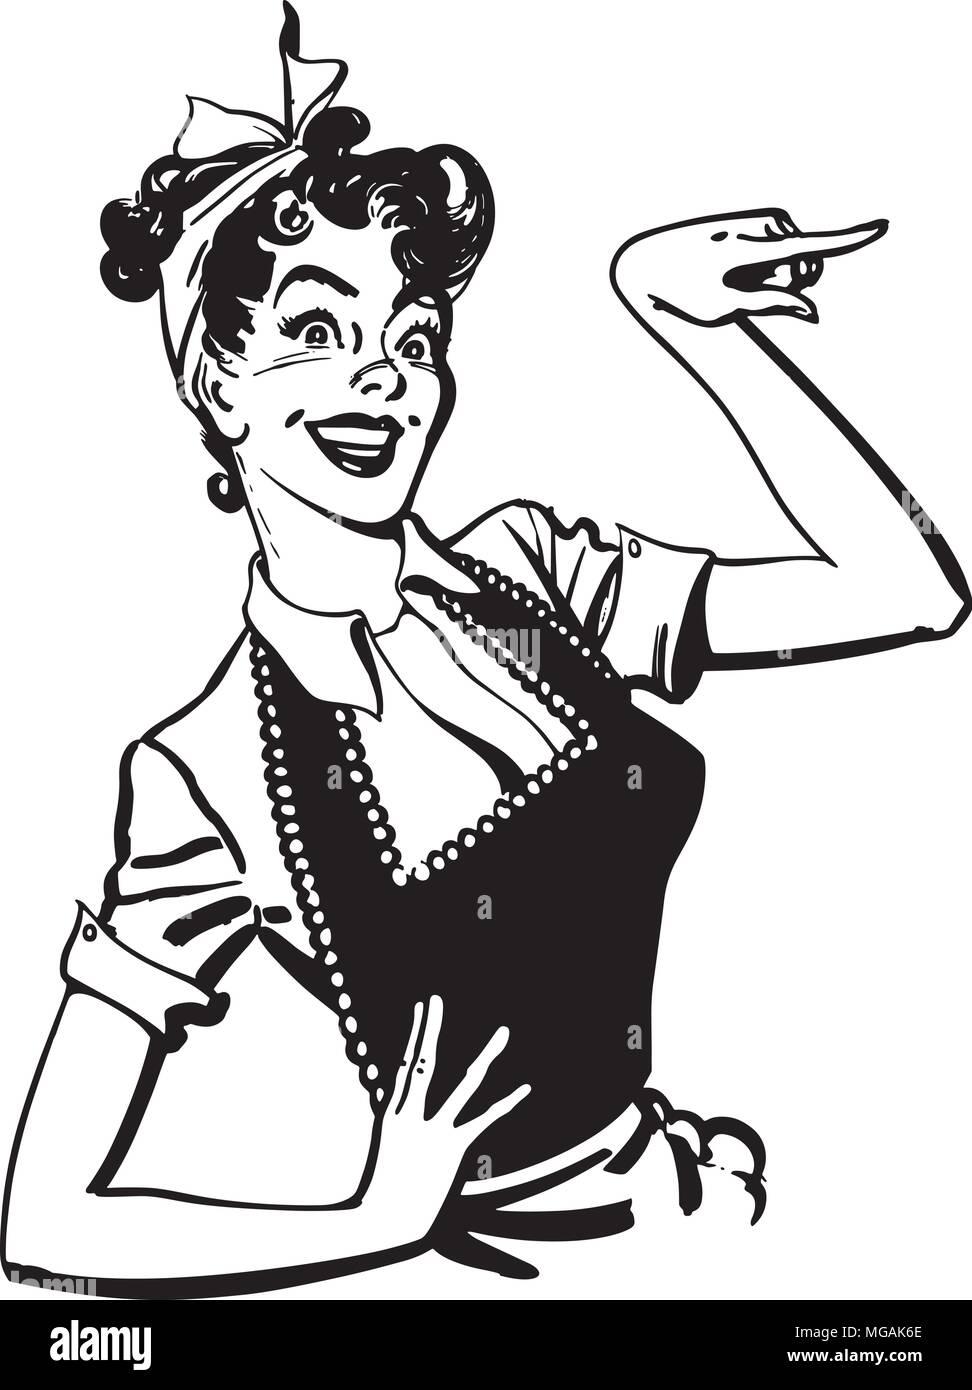 Terrific Pointing Housewife Retro Clipart Illustration Stock Vector Interior Design Ideas Clesiryabchikinfo